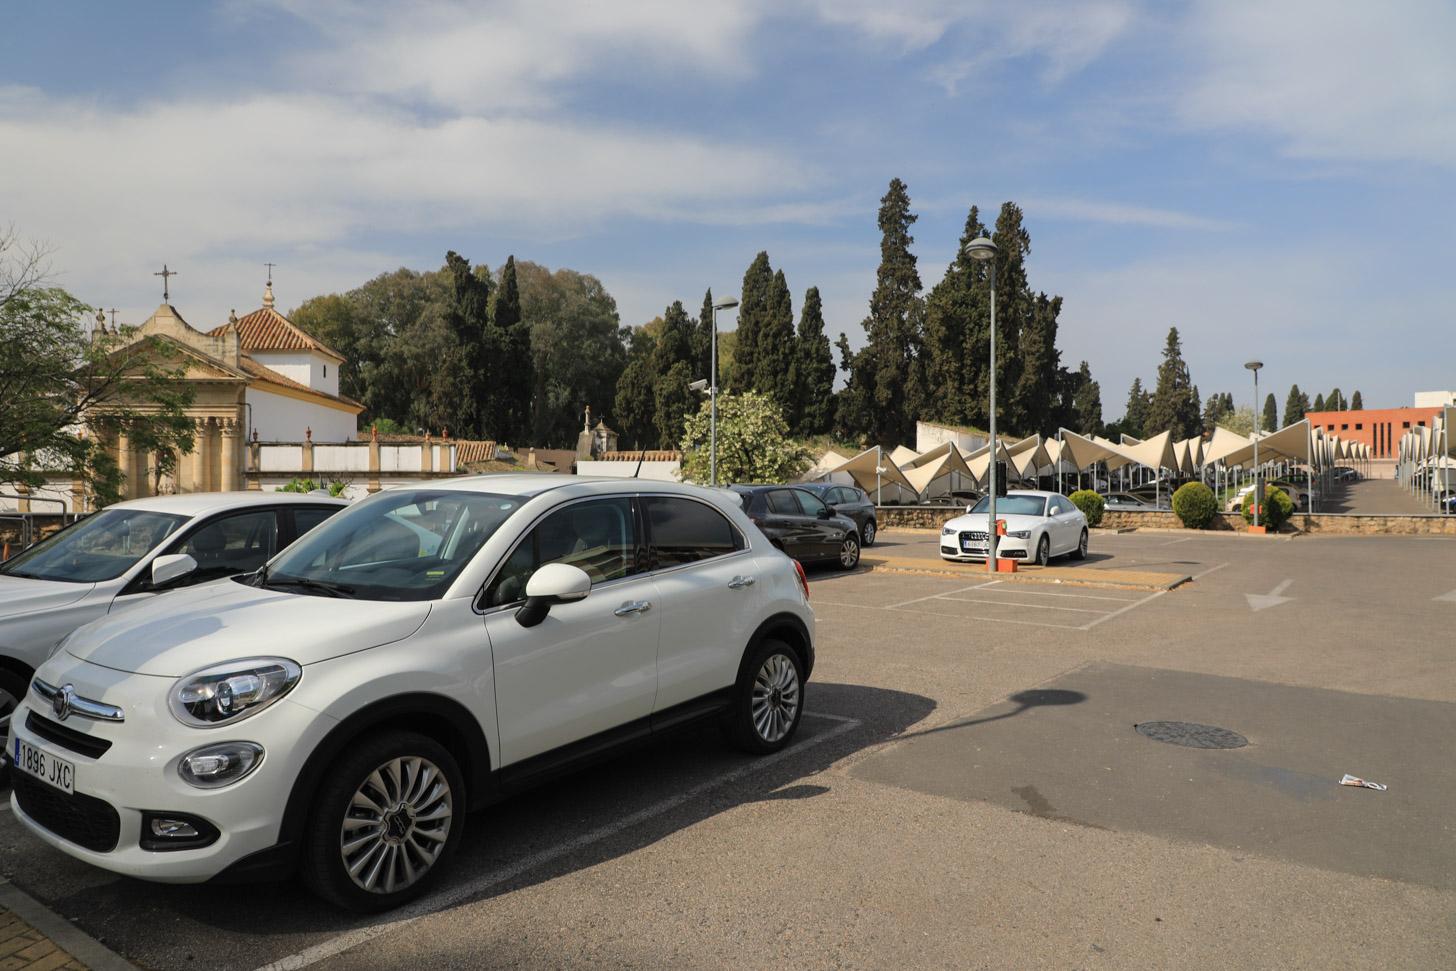 Parkeren in Córdoba